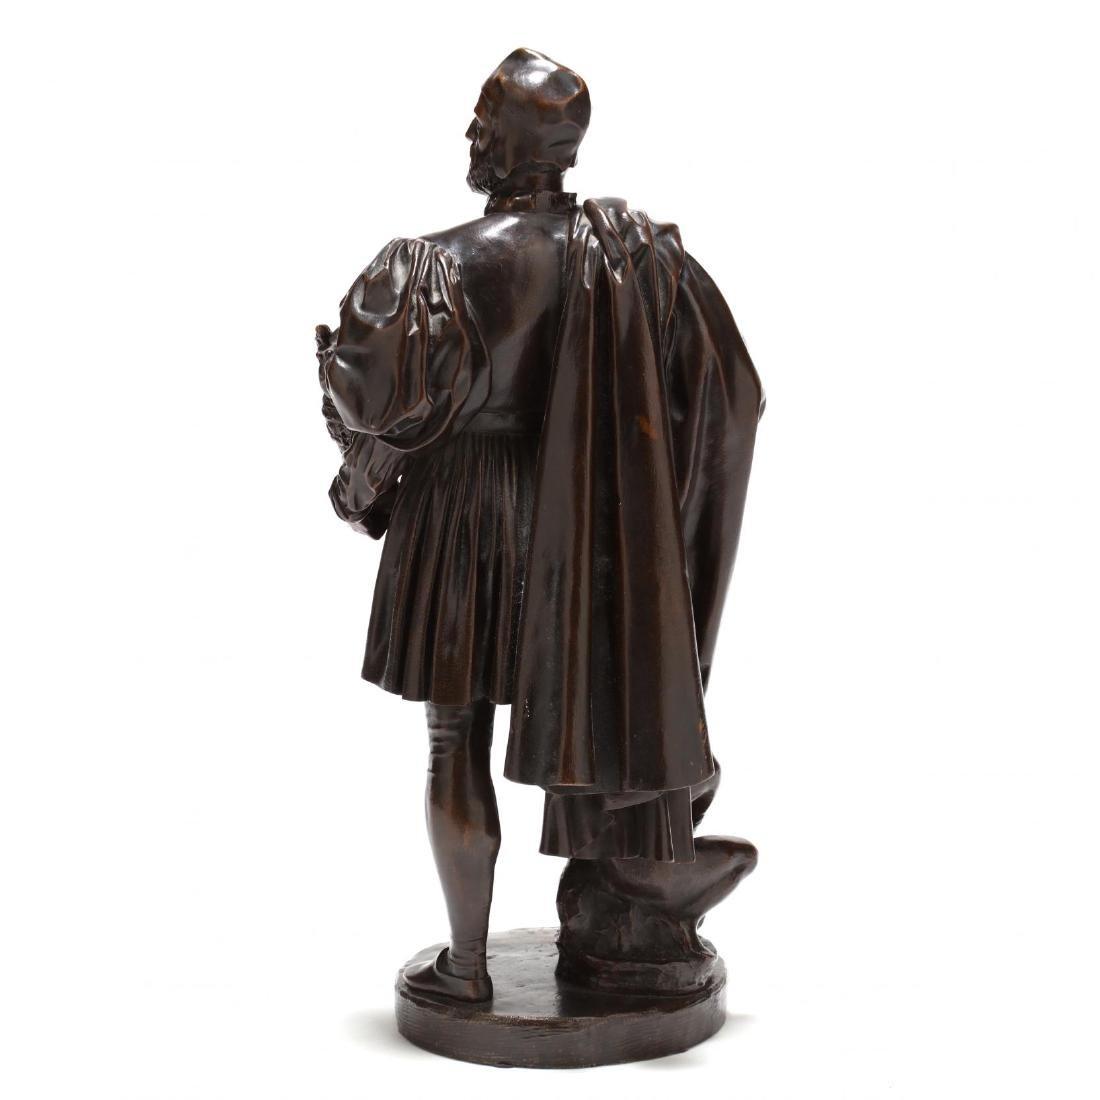 Antique Bronze Sculpture of a Renaissance Man - 5